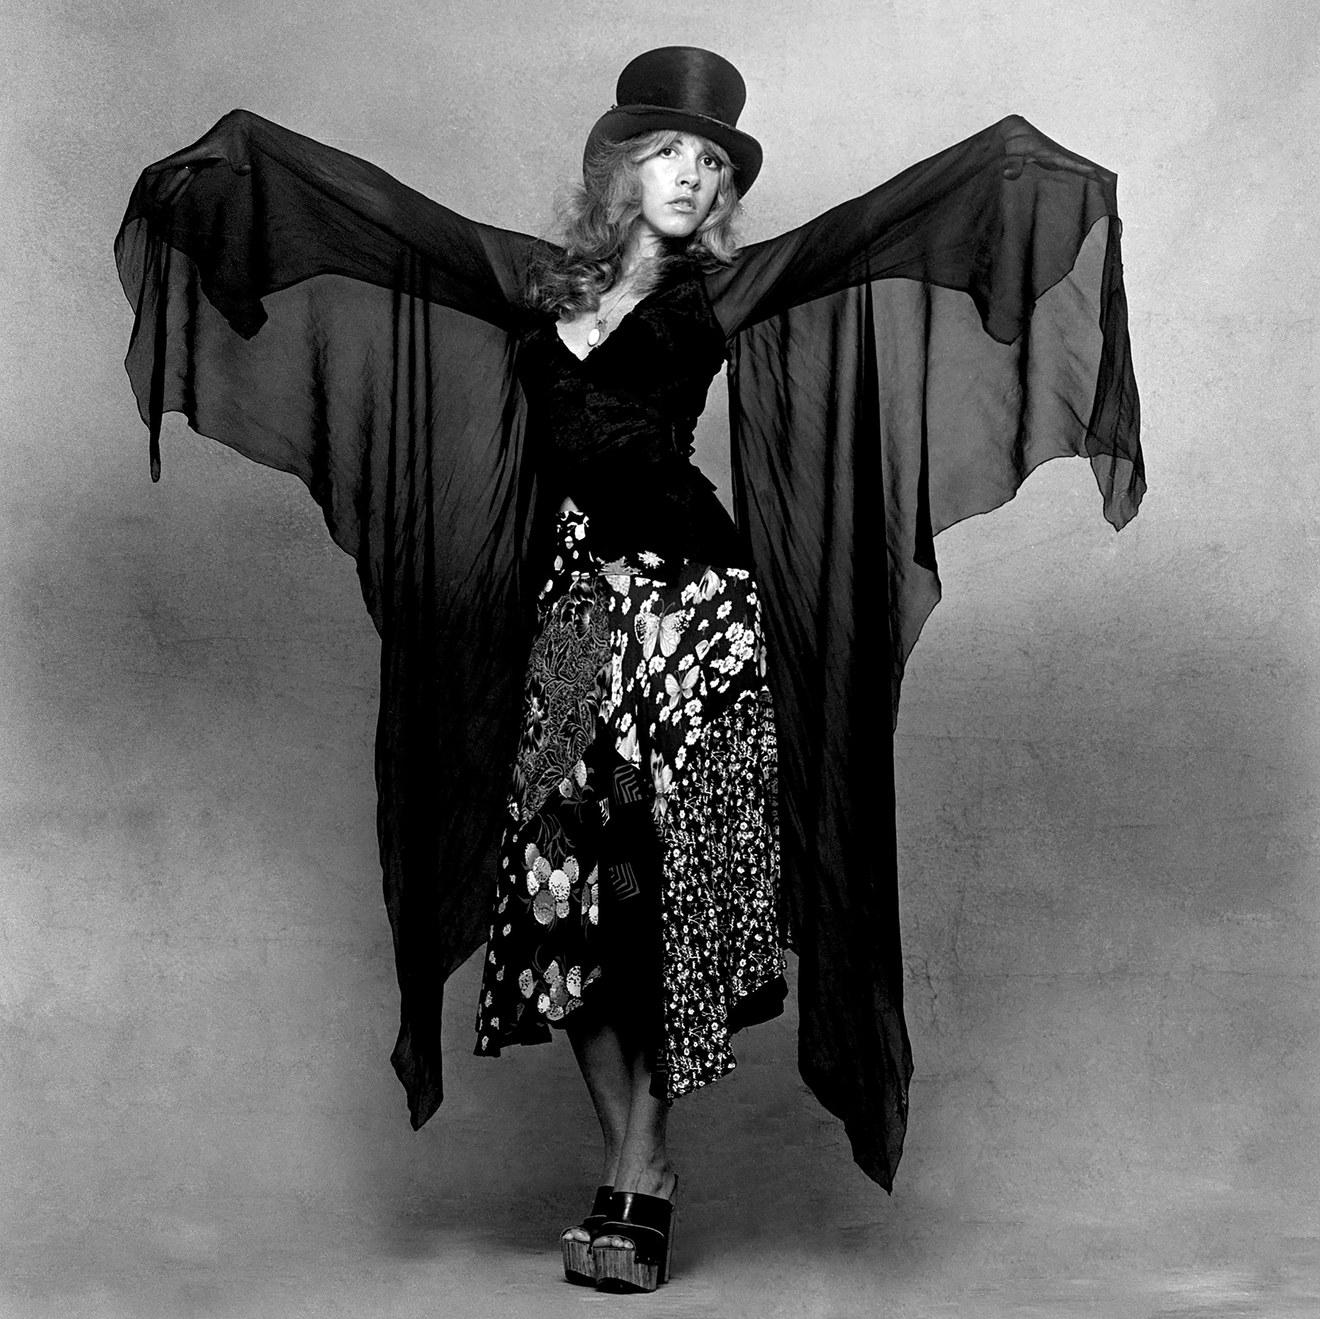 Happy Birthday Stevie Nicks 5 Ways To Channel Her Boho Chic Style Stevie Nicks Stevie Nicks Style Stevie Nicks Costume [ 1319 x 1320 Pixel ]